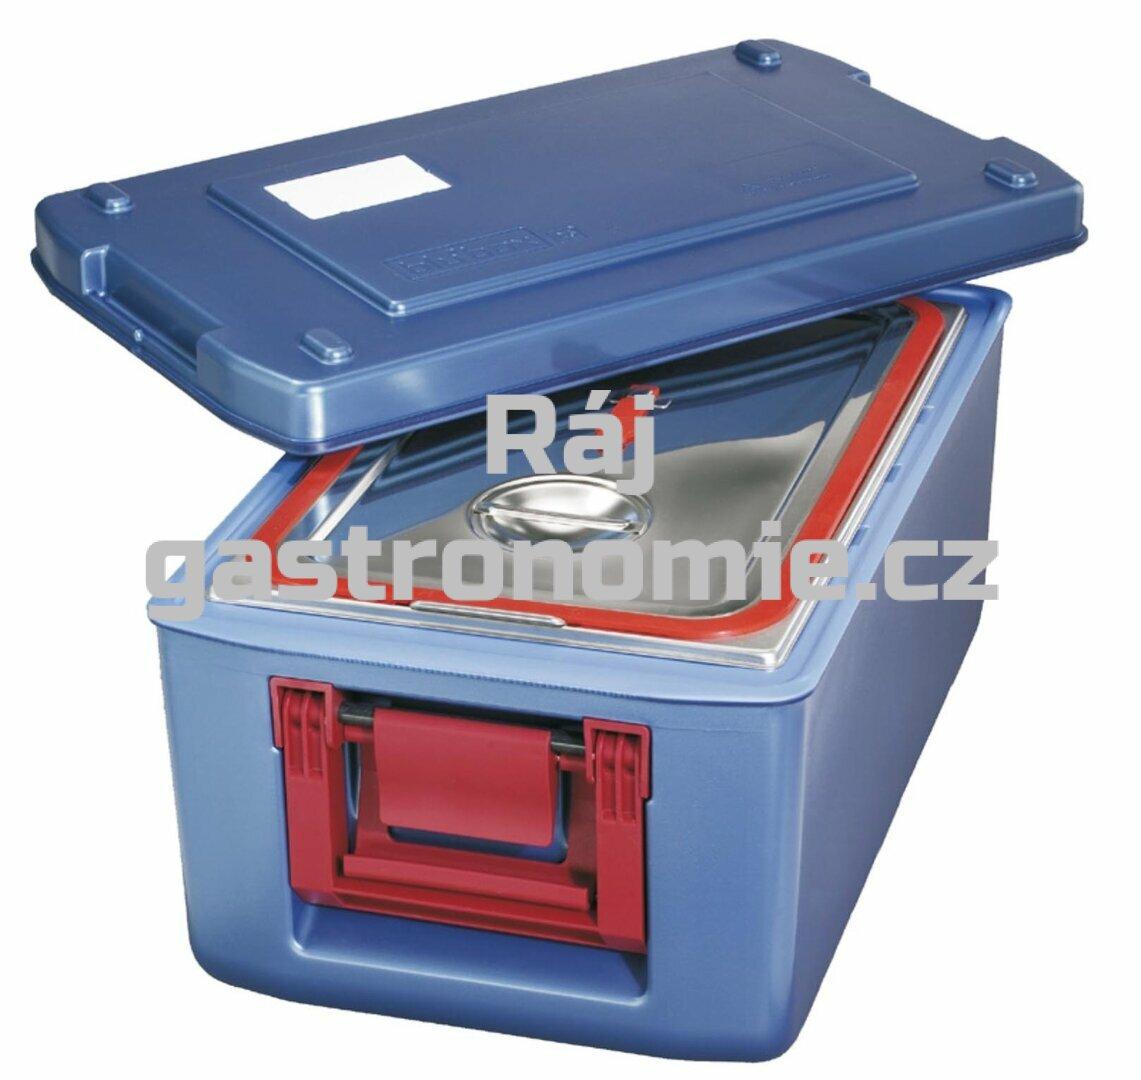 BLU'BOX 26